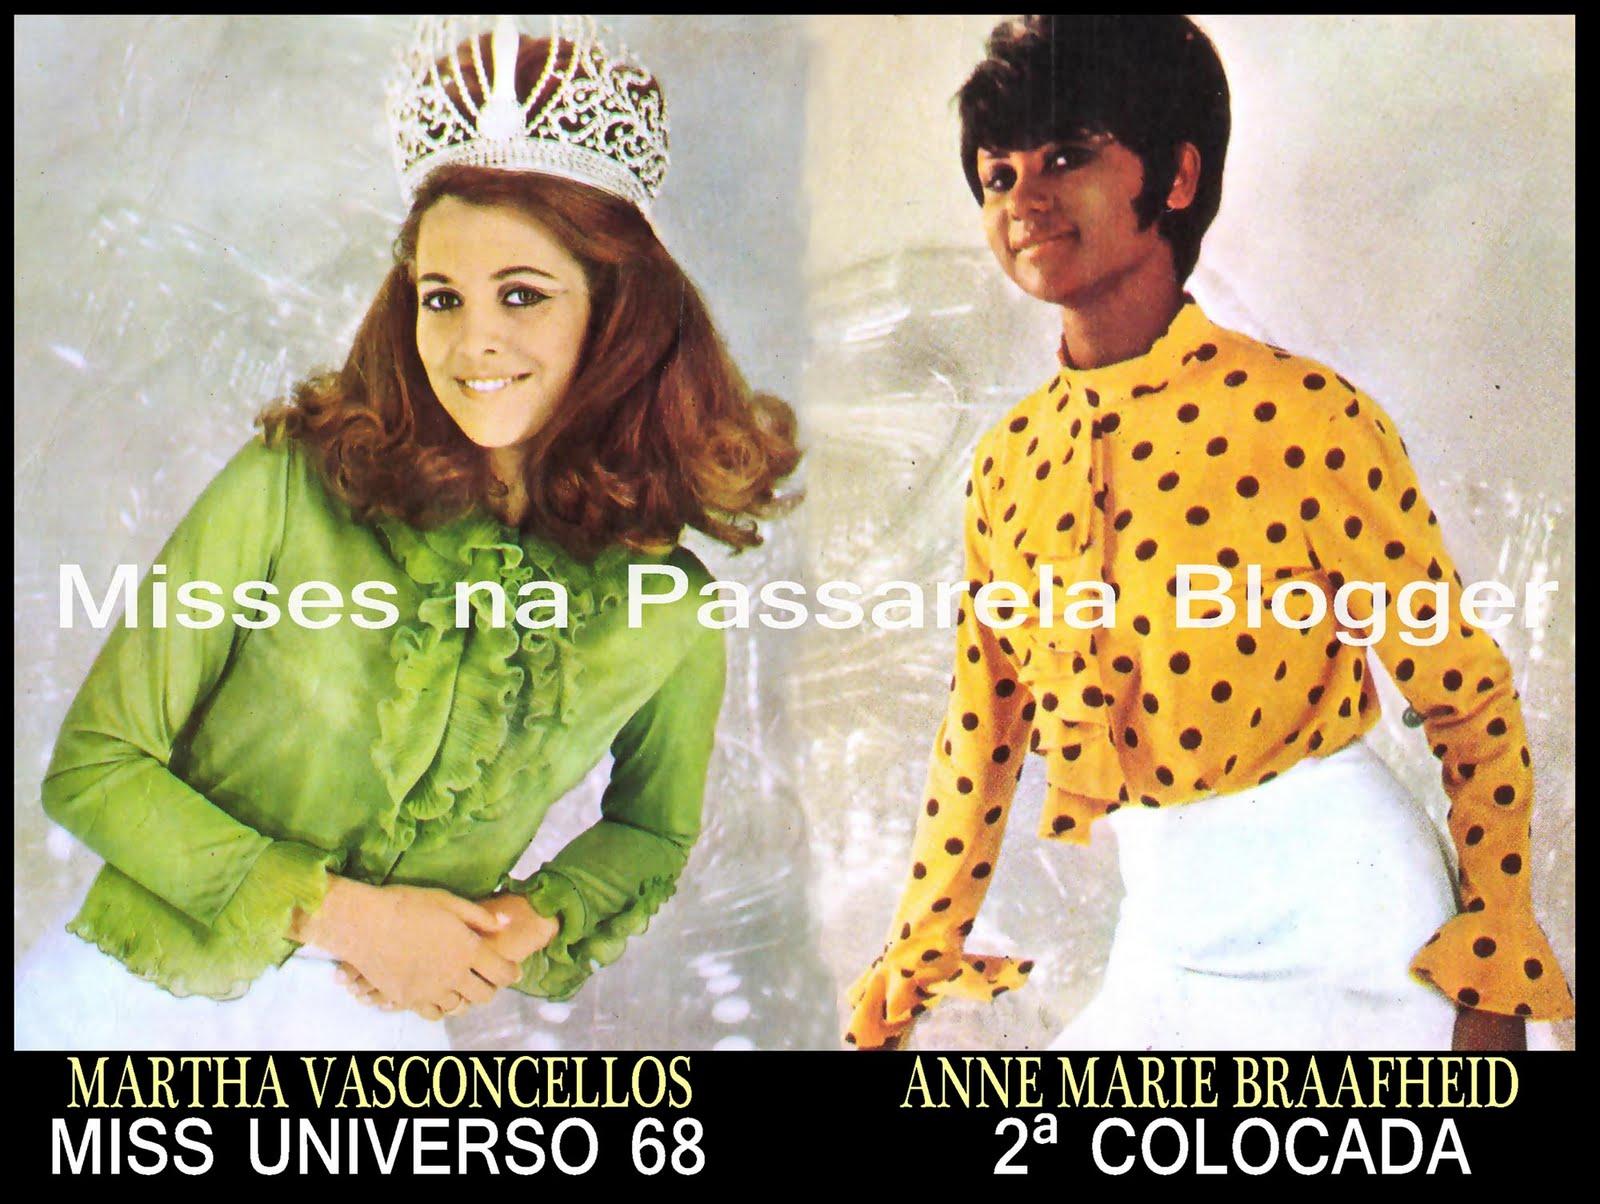 martha vasconcelos, miss universe 1968. Estrel10